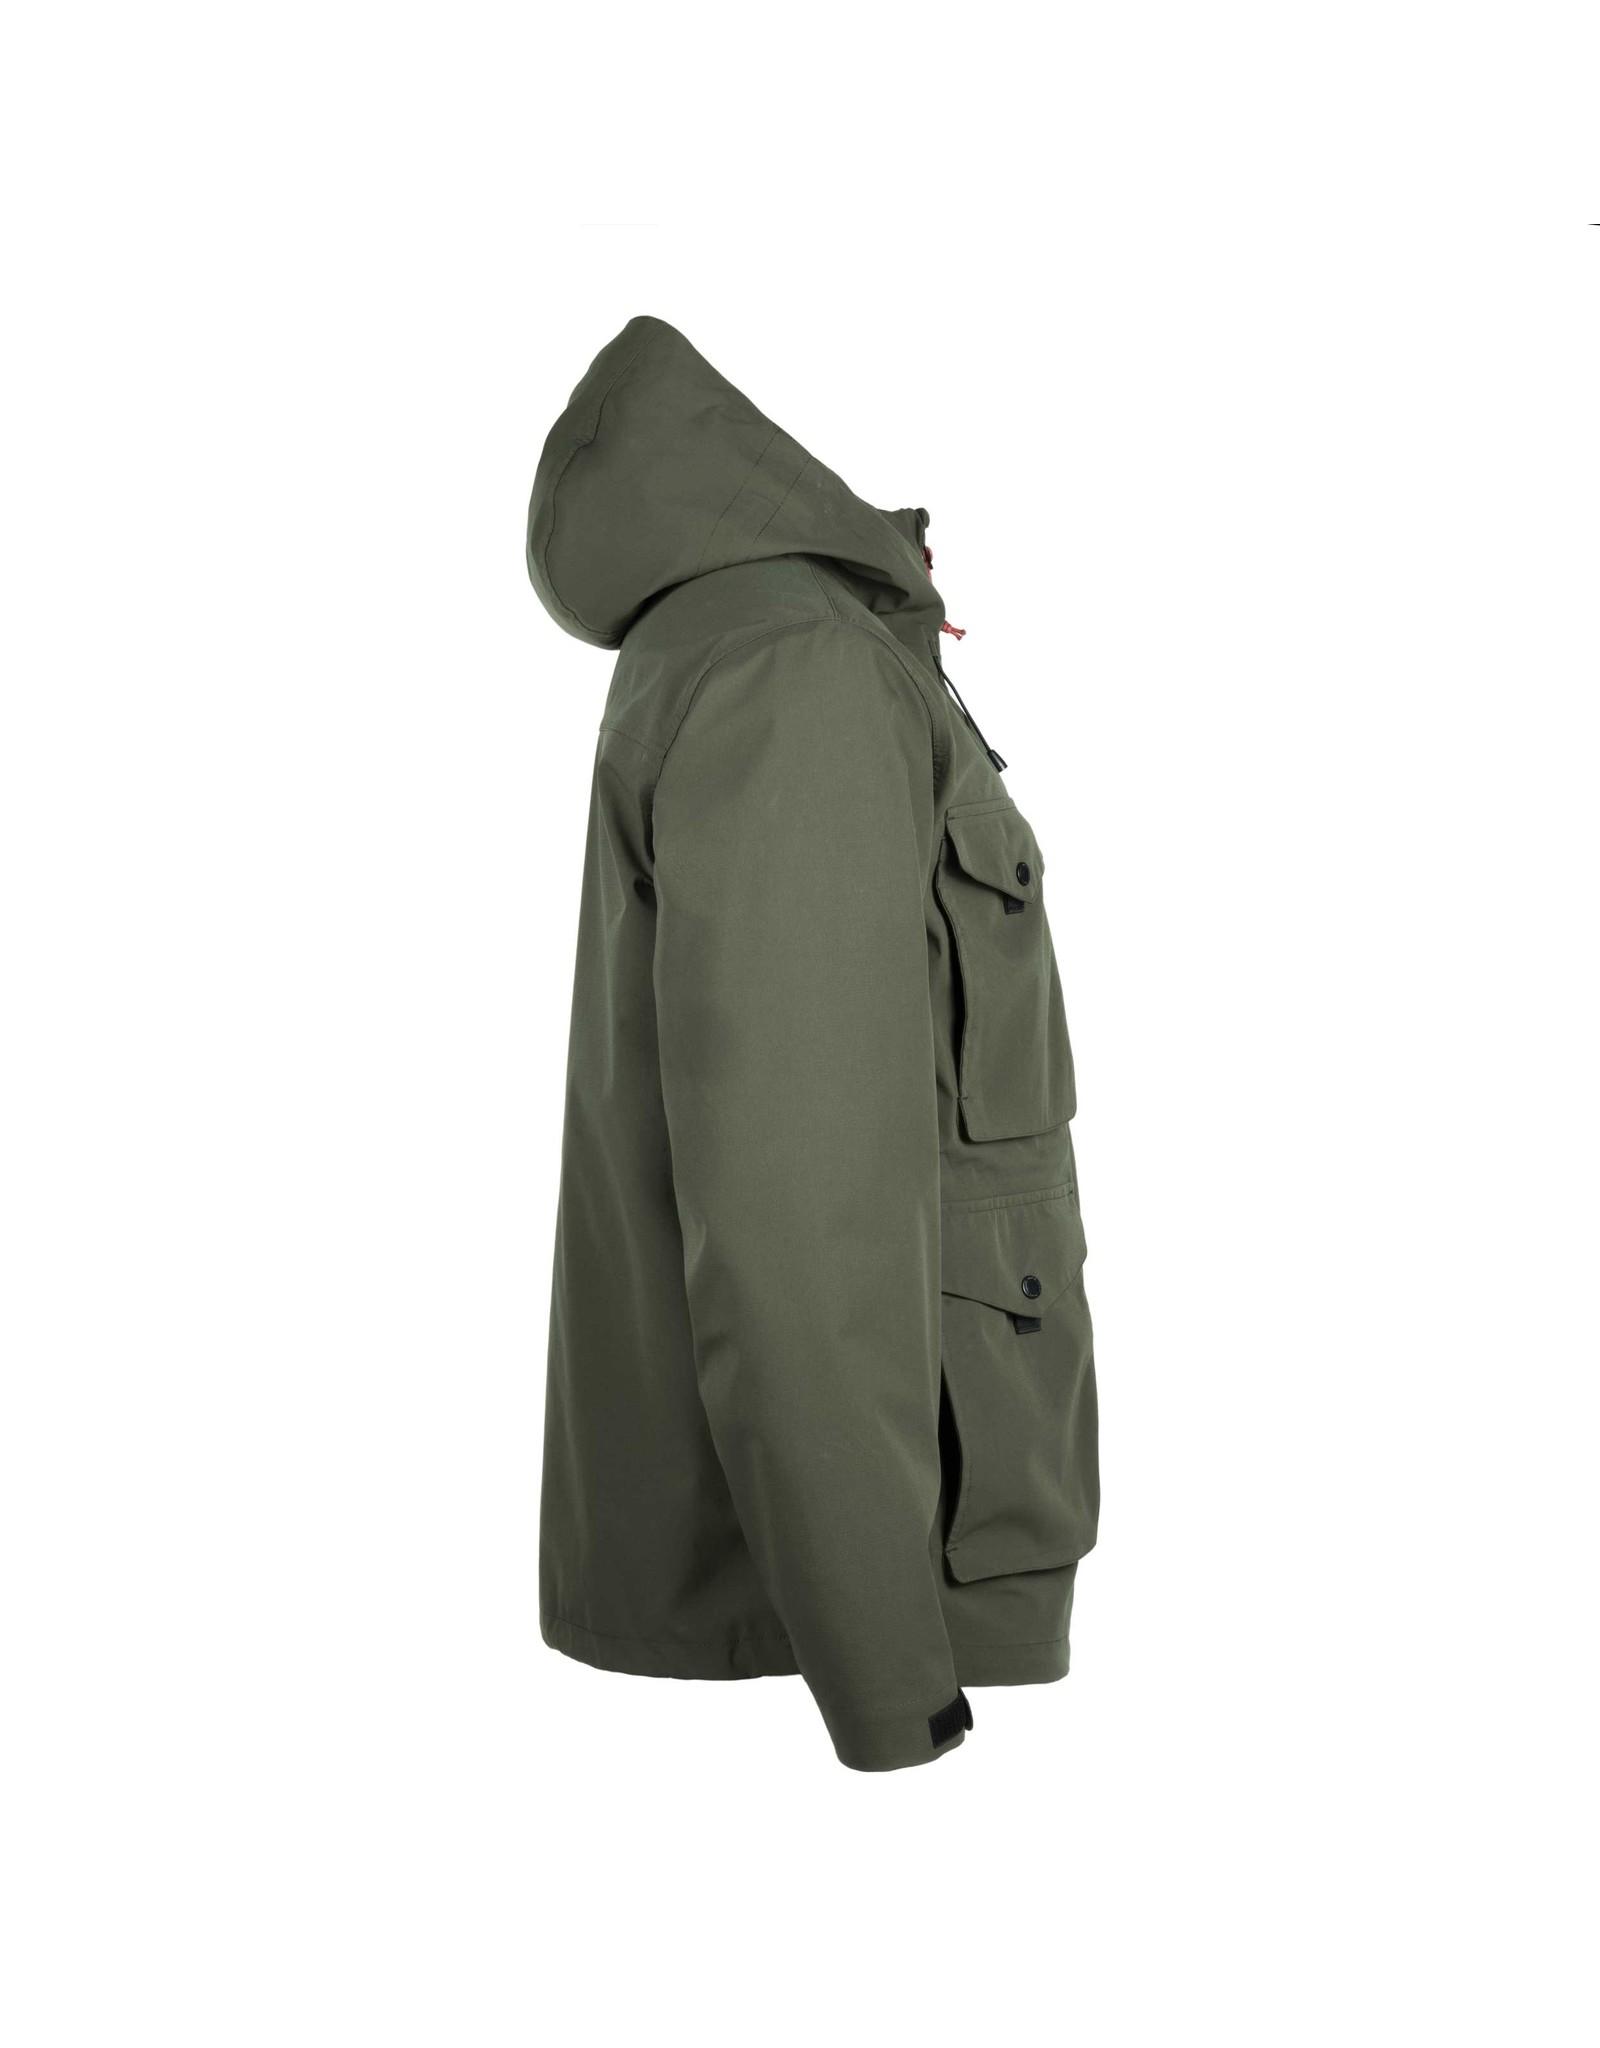 HOOKE Matapedia Rain Jacket Olive